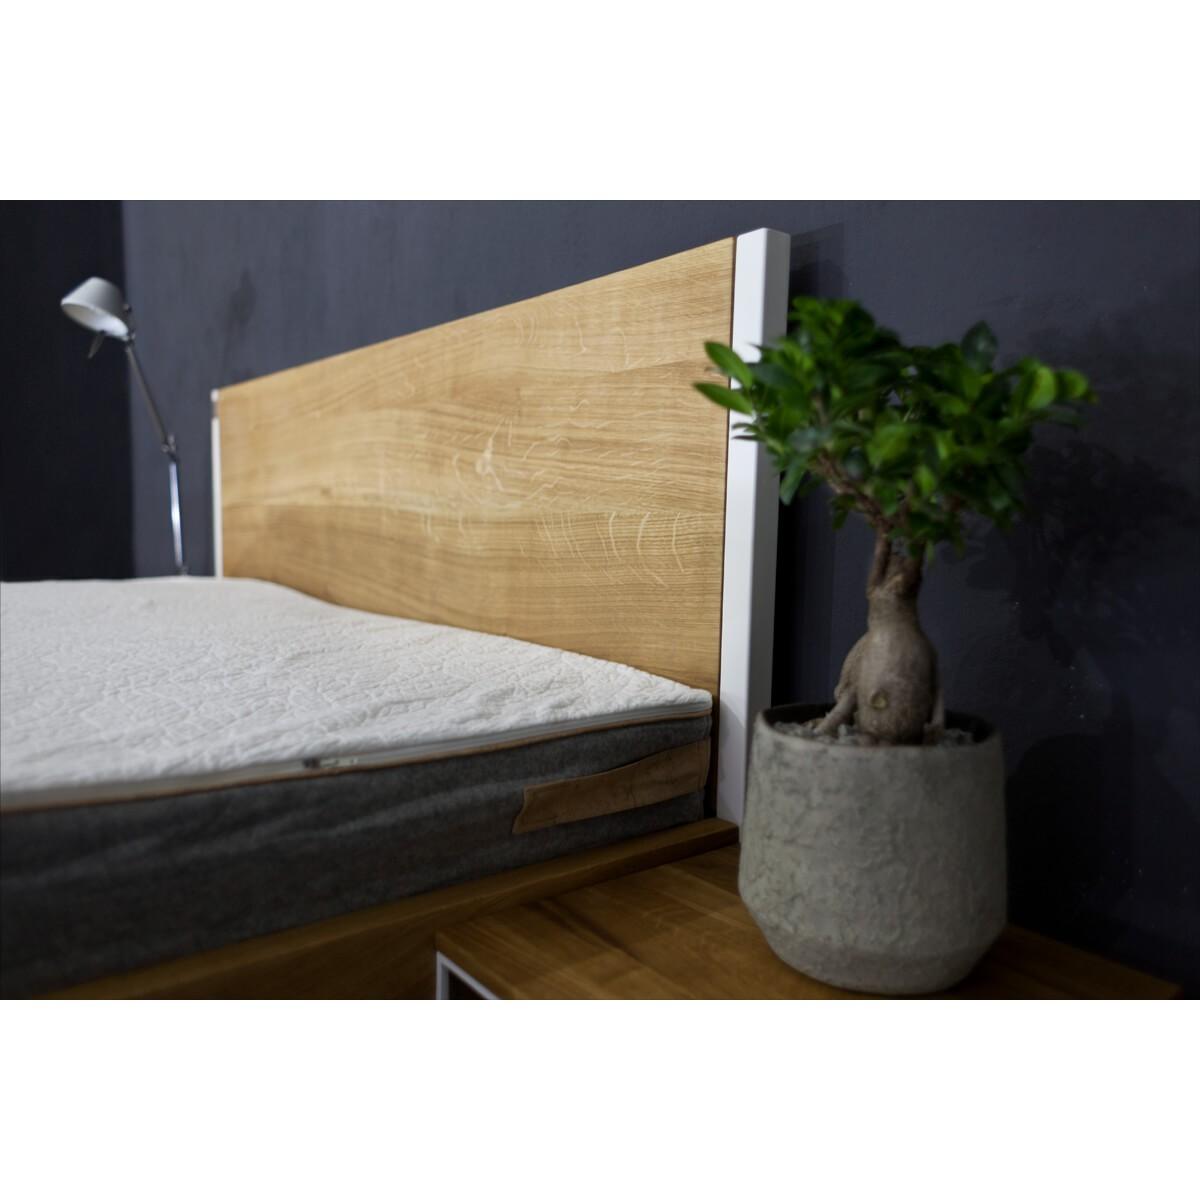 Nature Oak Bett aus Massivholz Eiche und Stahl  - gerade Rückwand